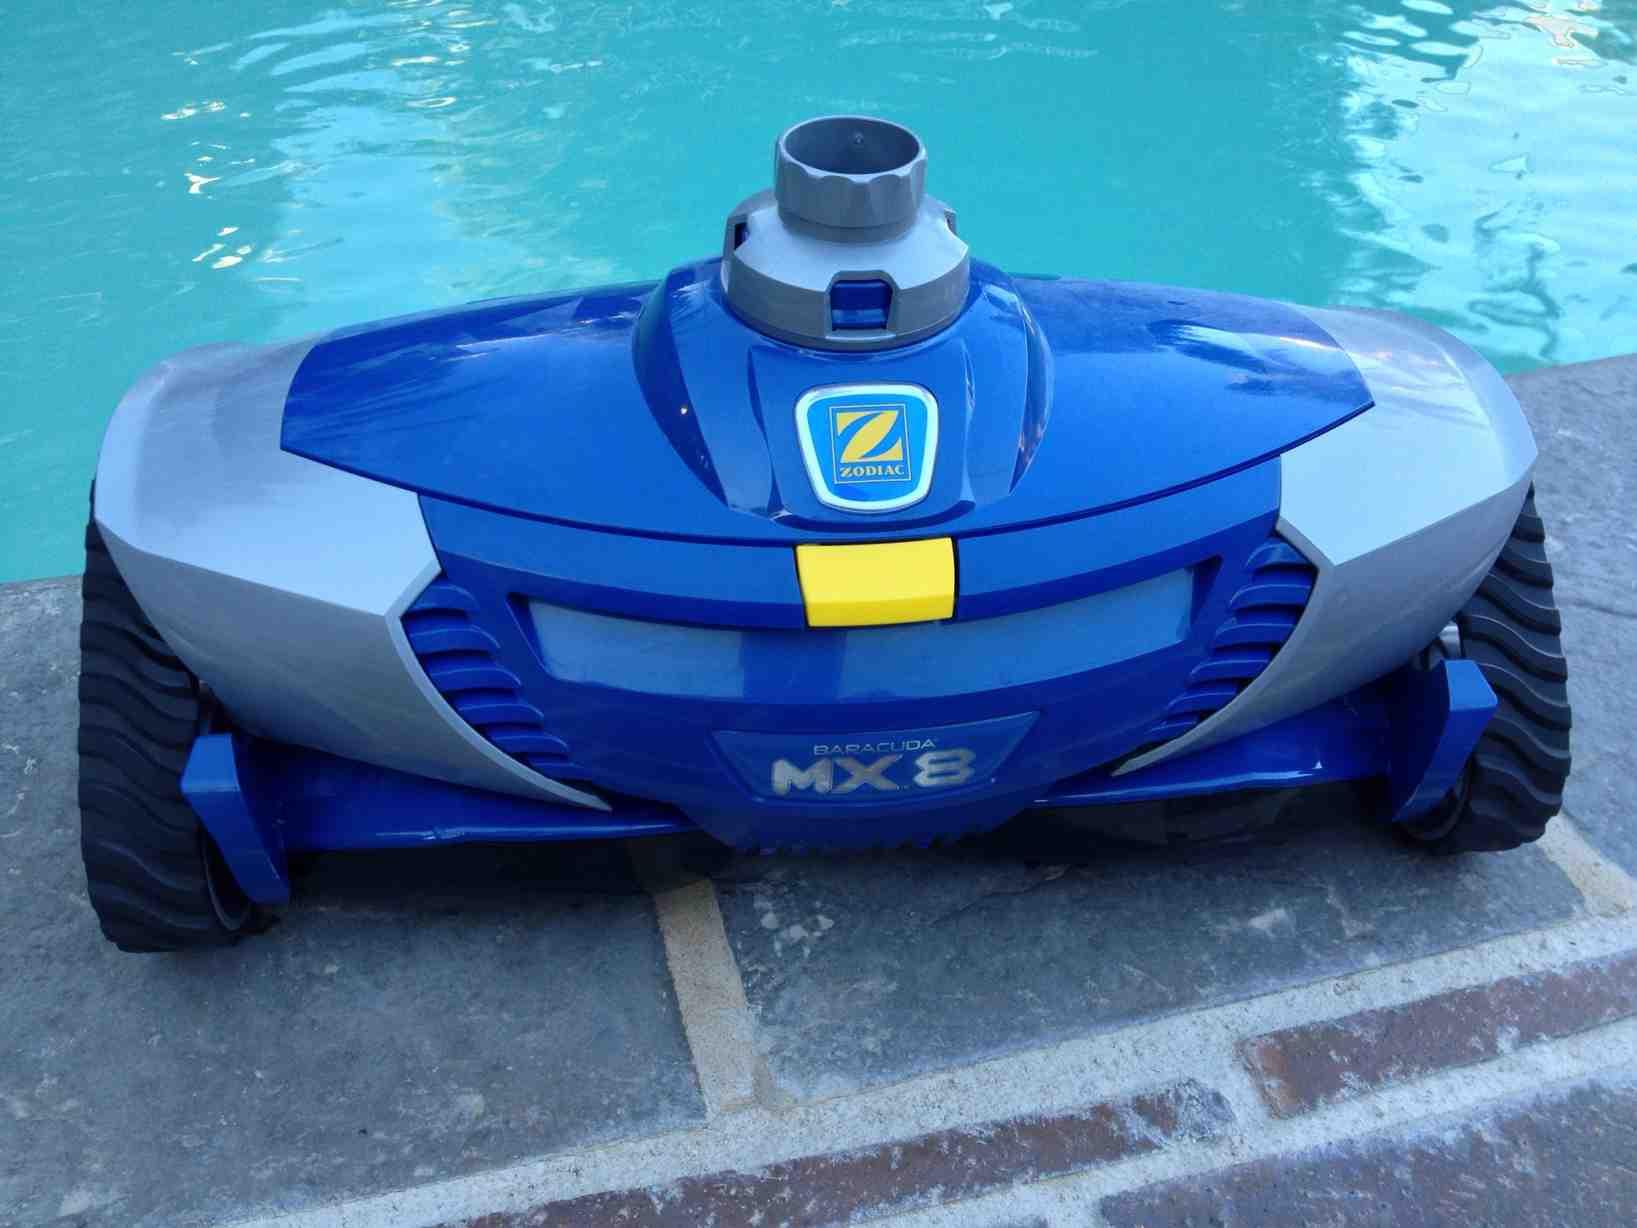 direction robot zodiac mx8